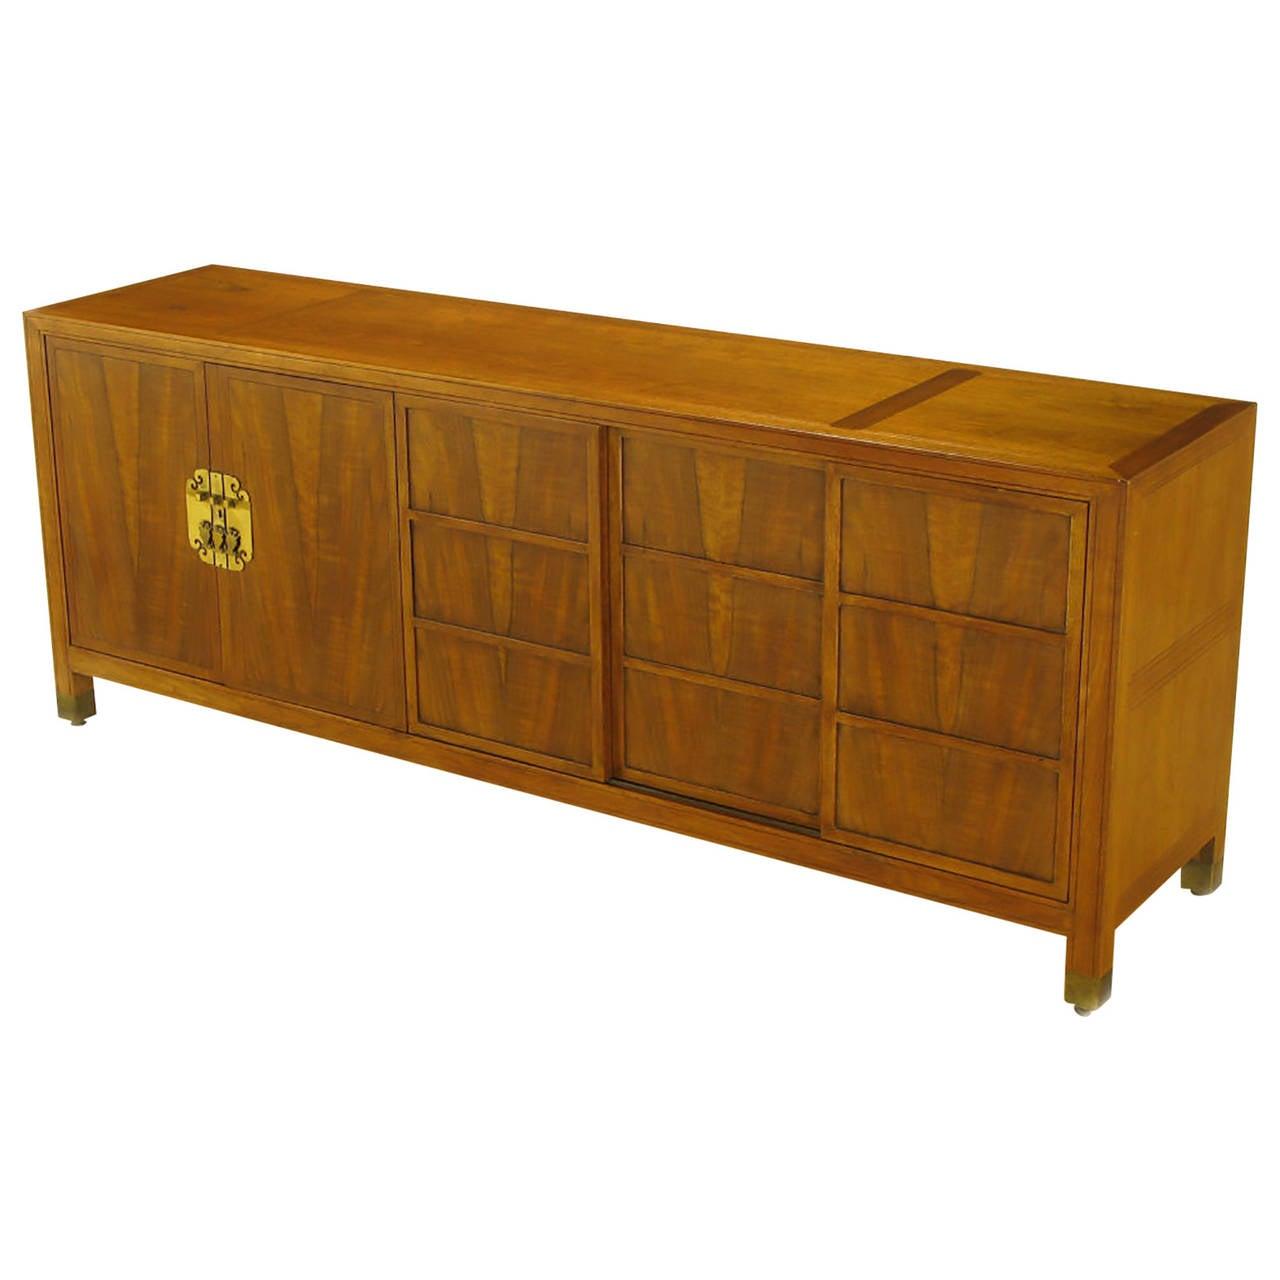 Frank Van Steenberg for Baker Far East Collection Walnut Sideboard